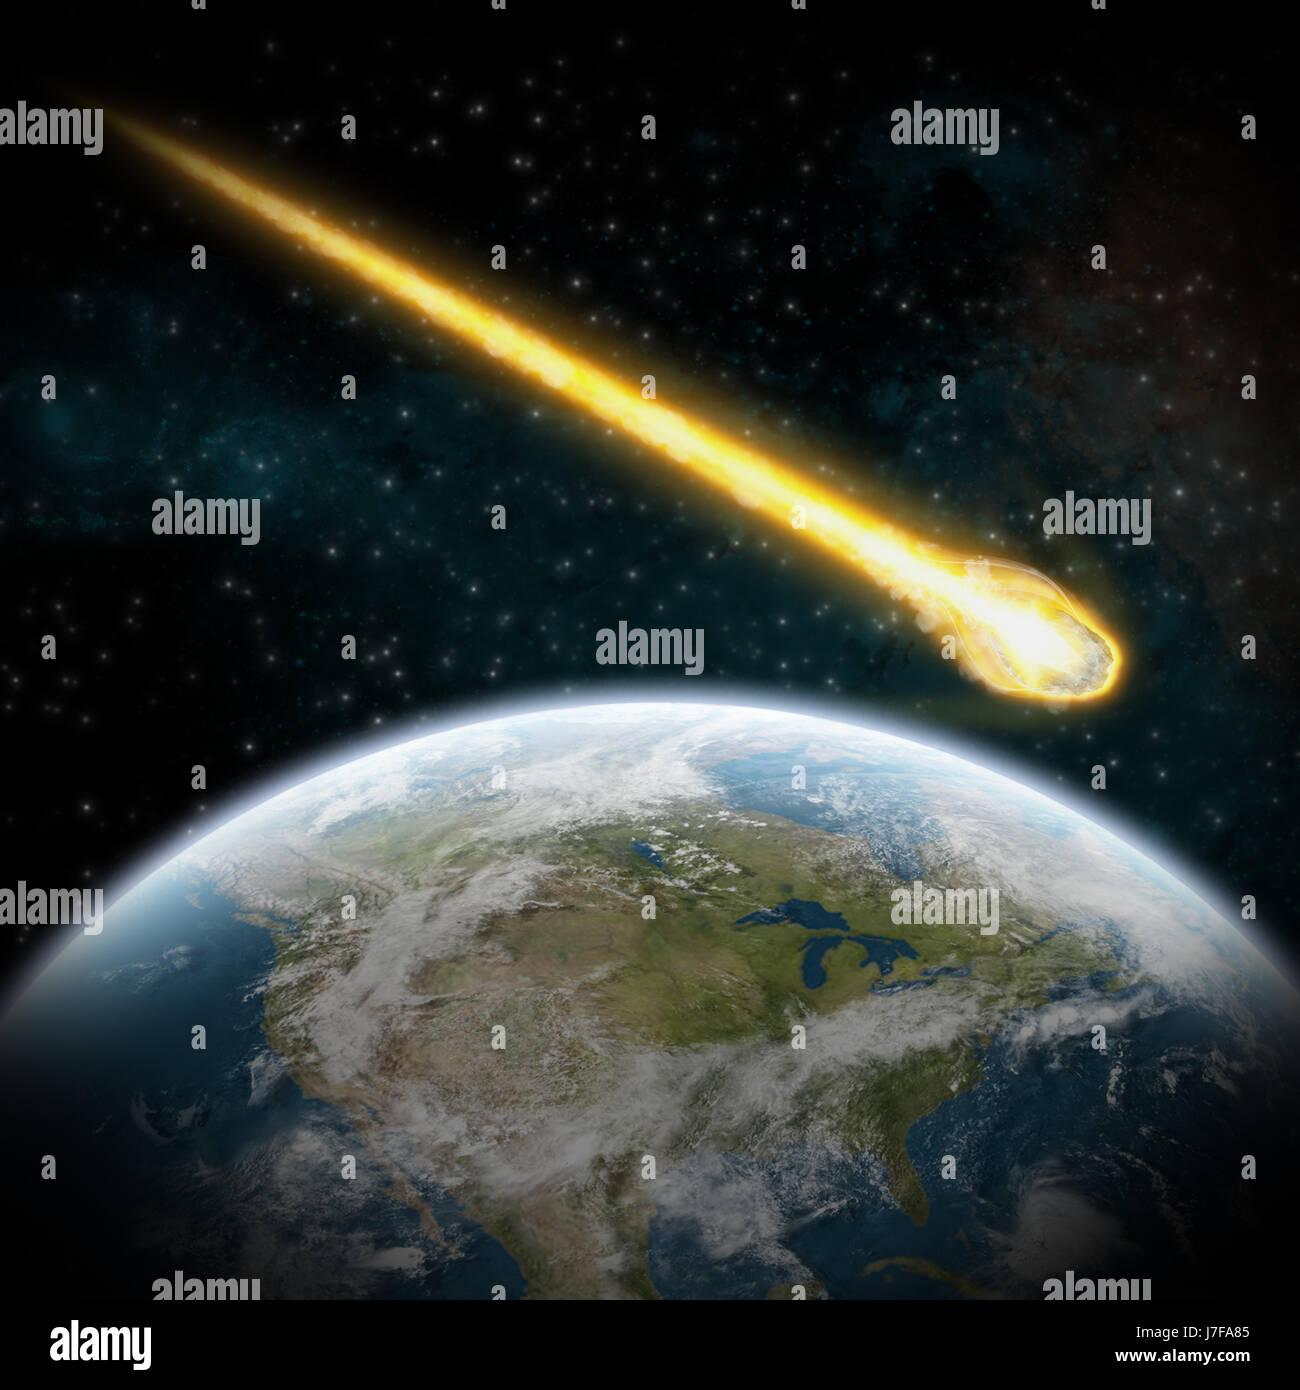 Tolle Komet Asteroid Meteor Arbeitsblatt Ideen - Super Lehrer ...